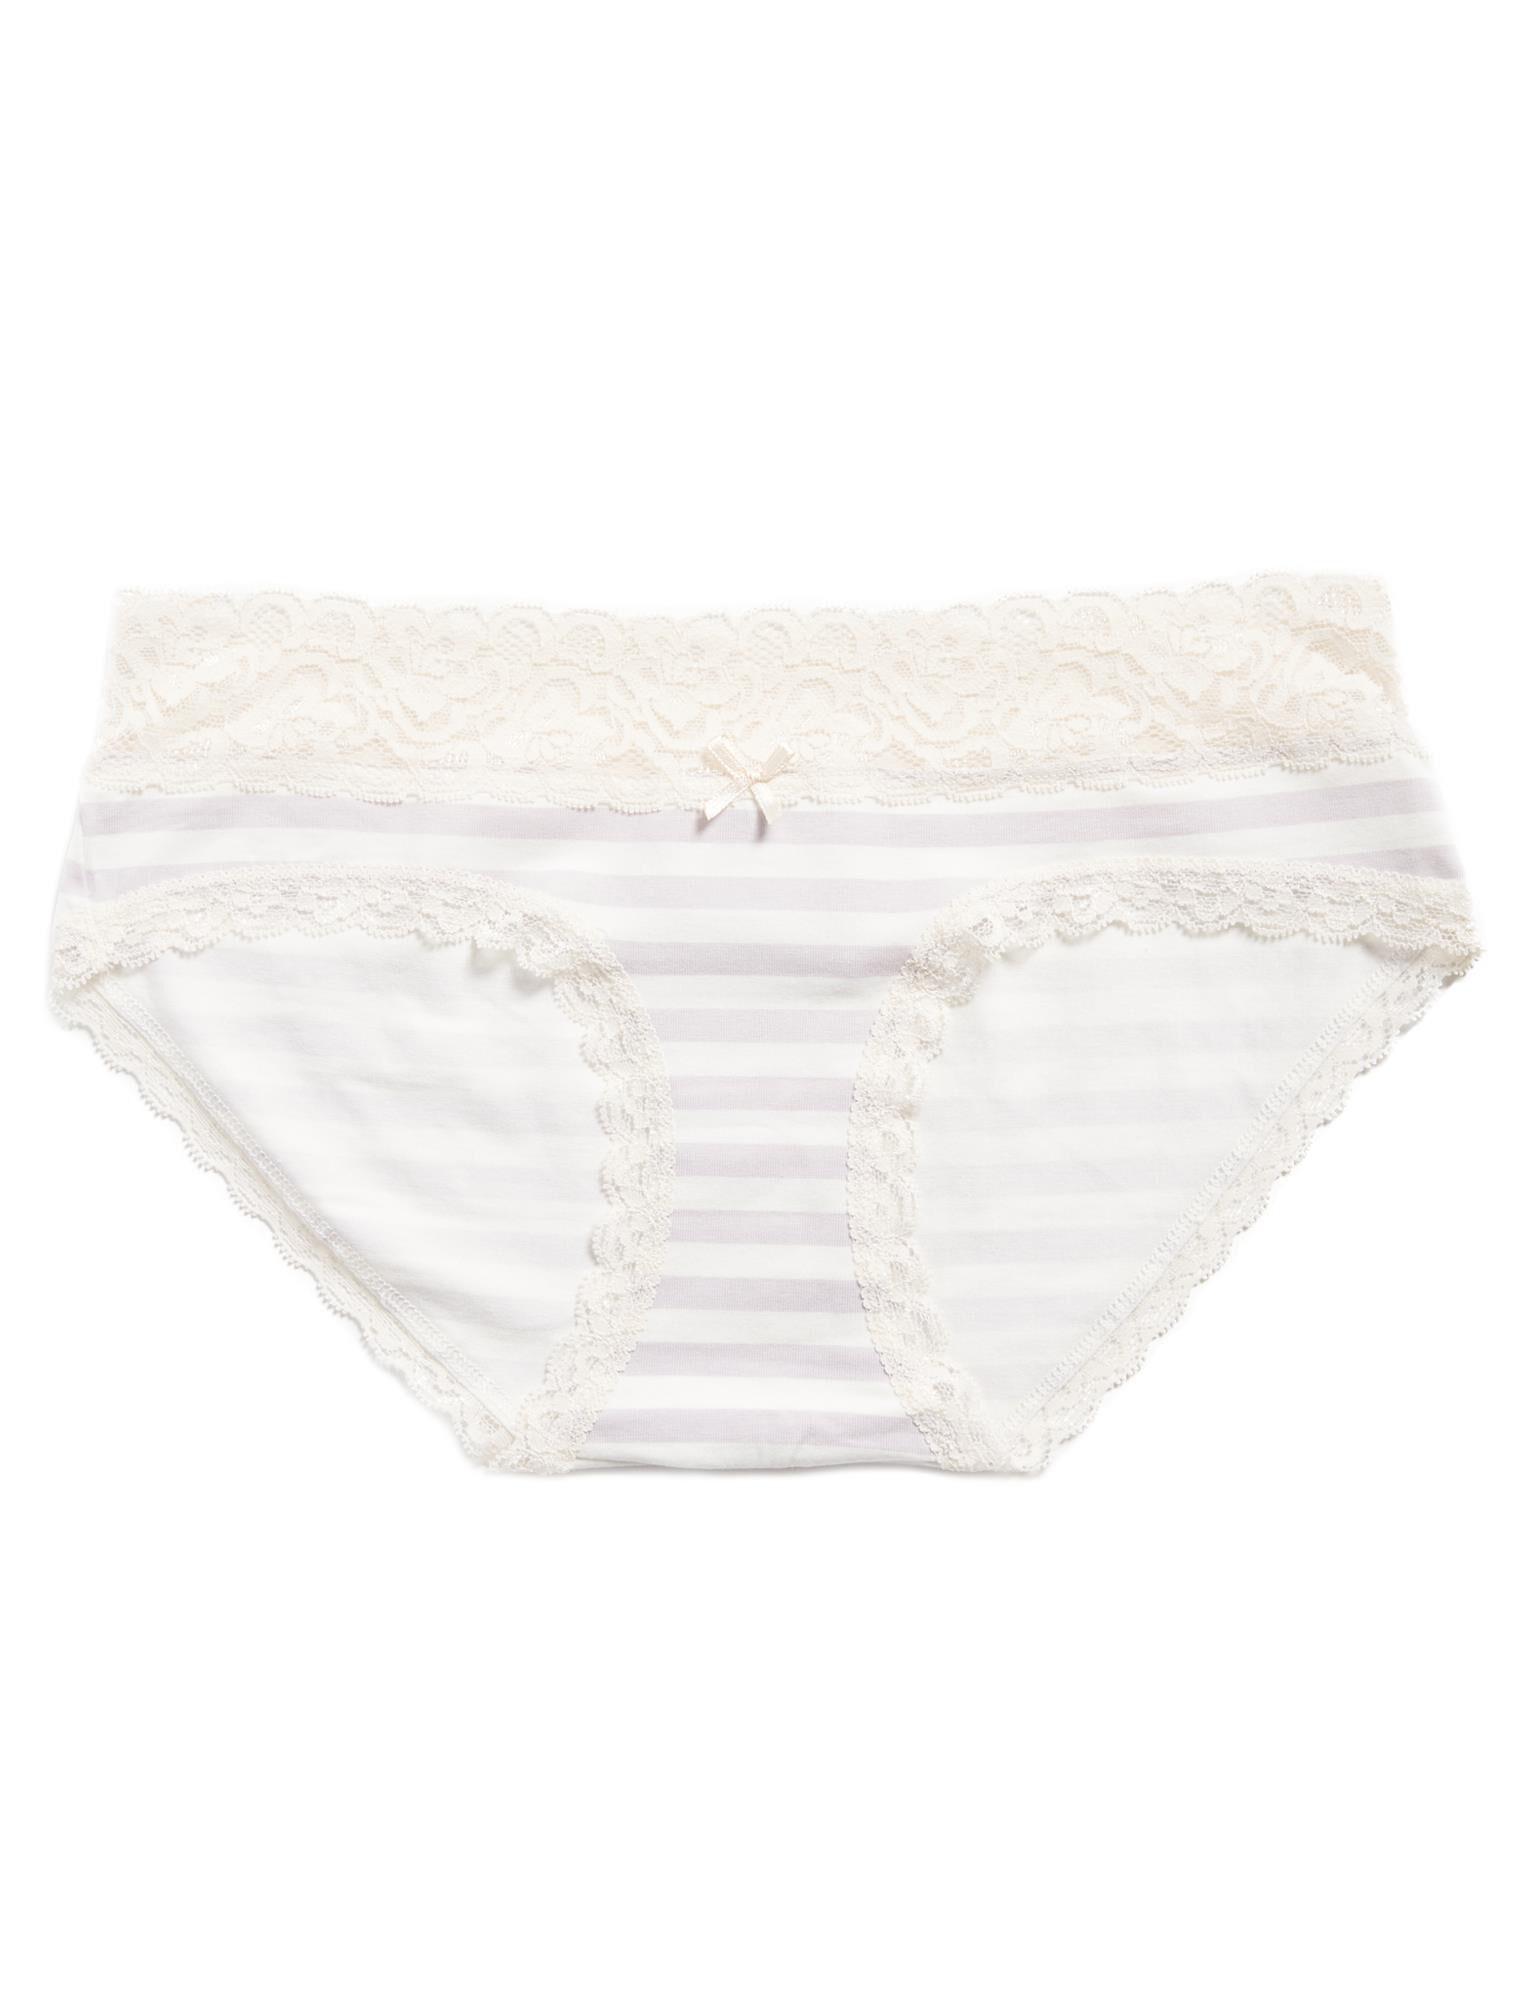 Jessica Simpson Lace Trim Maternity Panty (single)